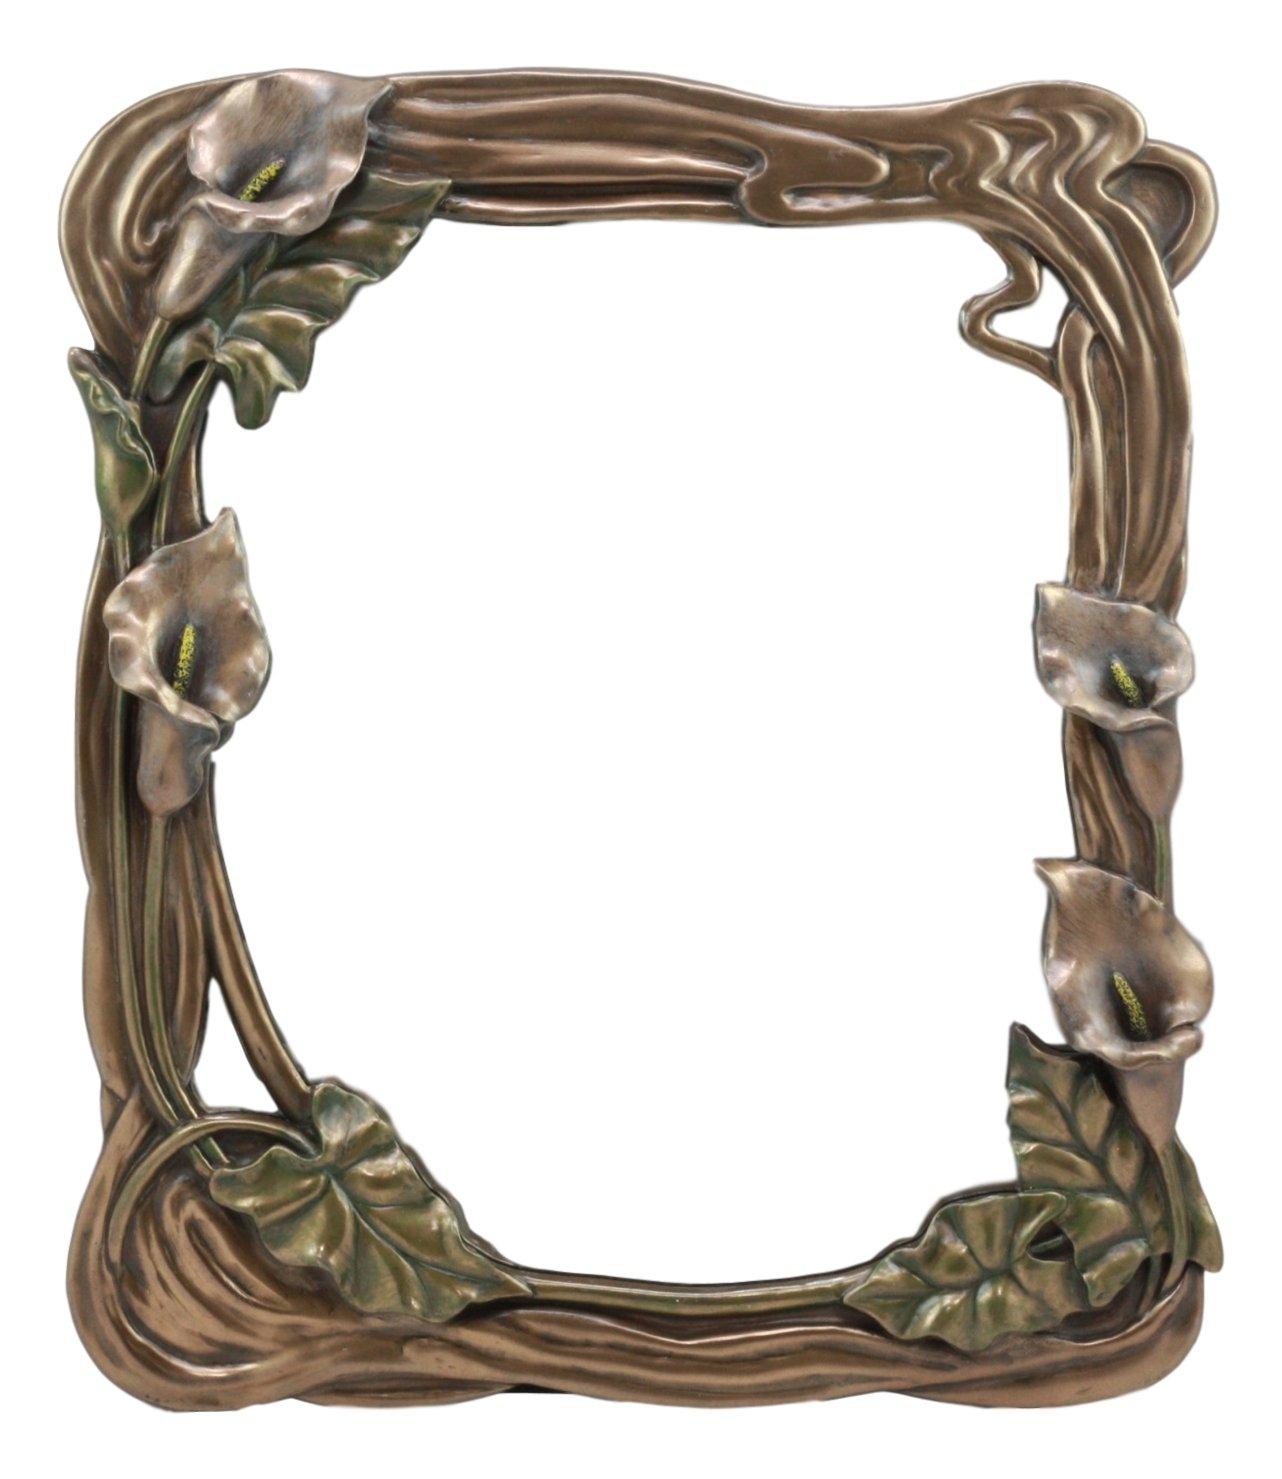 Ebros Fleur De Lis Beautiful Calla Lily Easel Back Or Wall Hanging Vanity Mirror Statue Art Nouveau Calla Lilly Decor Vanity Mirror Figurine